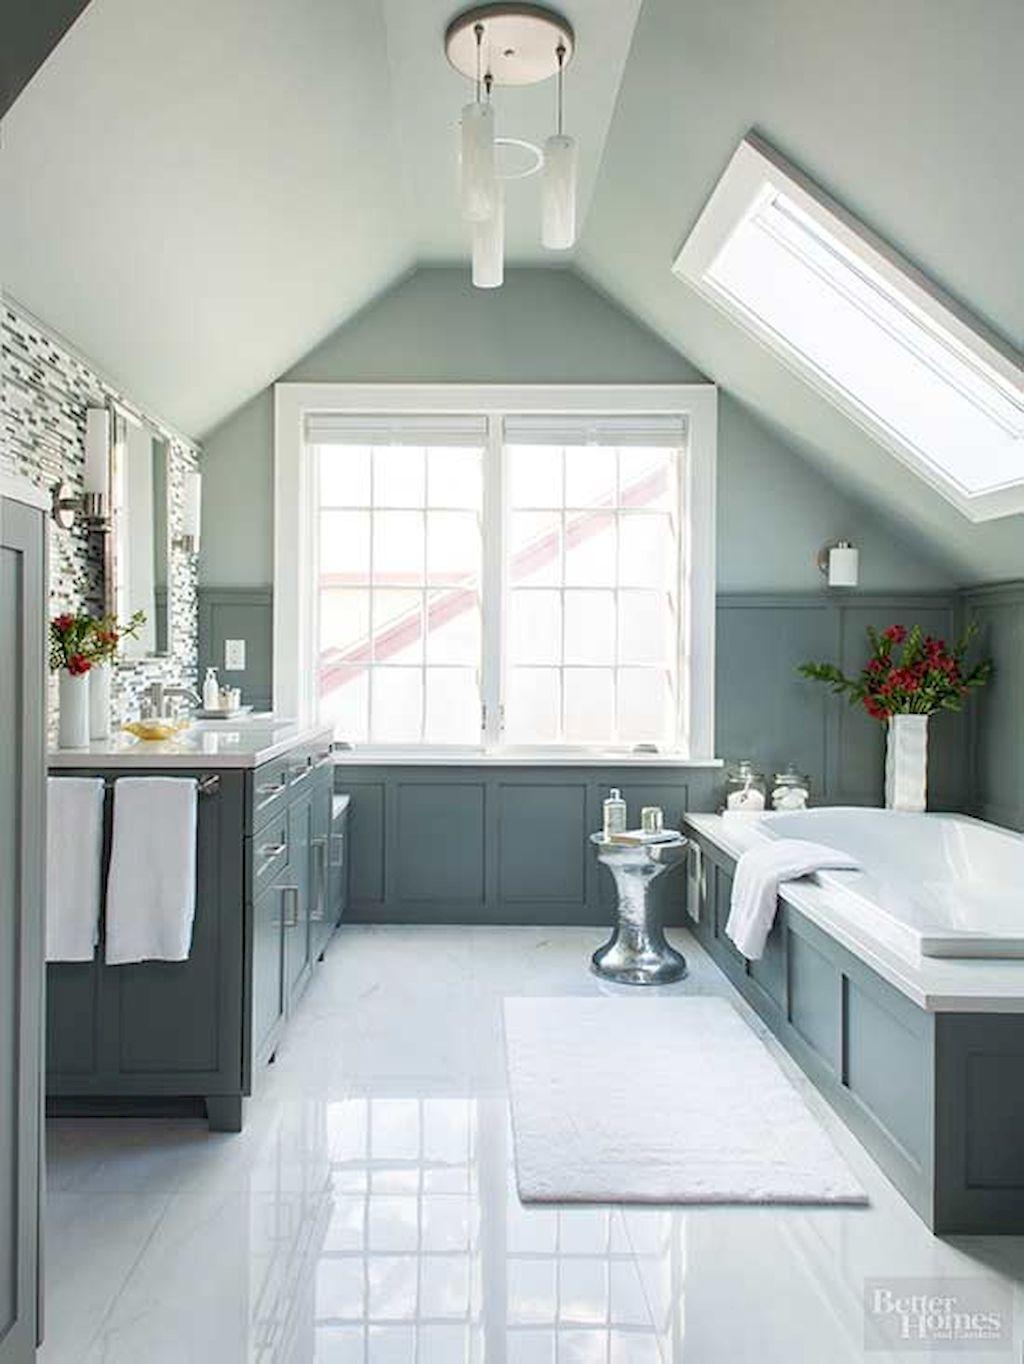 25 Amazing Bathroom Design Ideas - Page 25 of 25 - Home & Garden Sphere